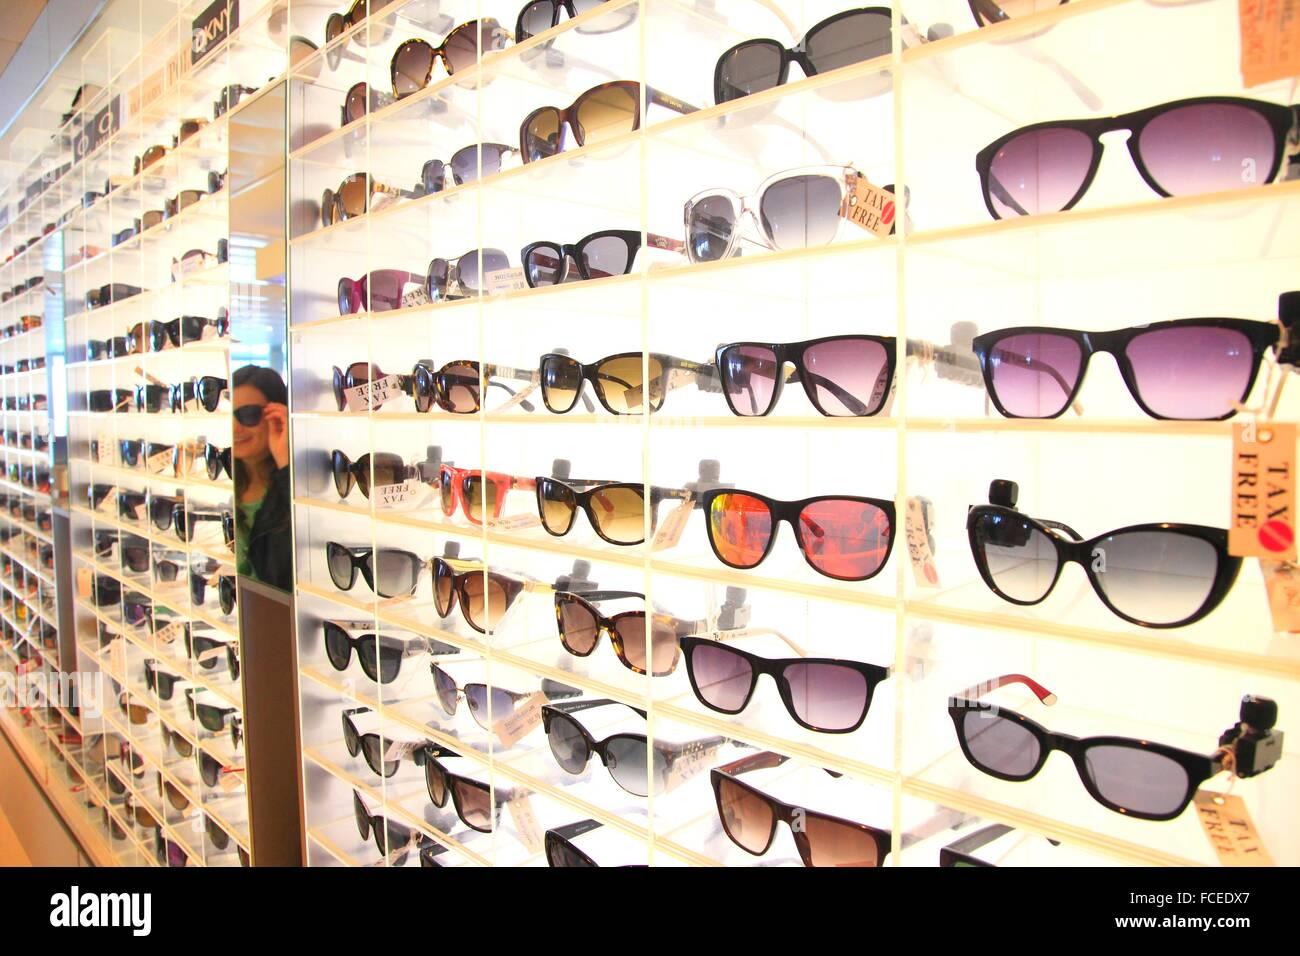 Optician, sunglasses - Stock Image